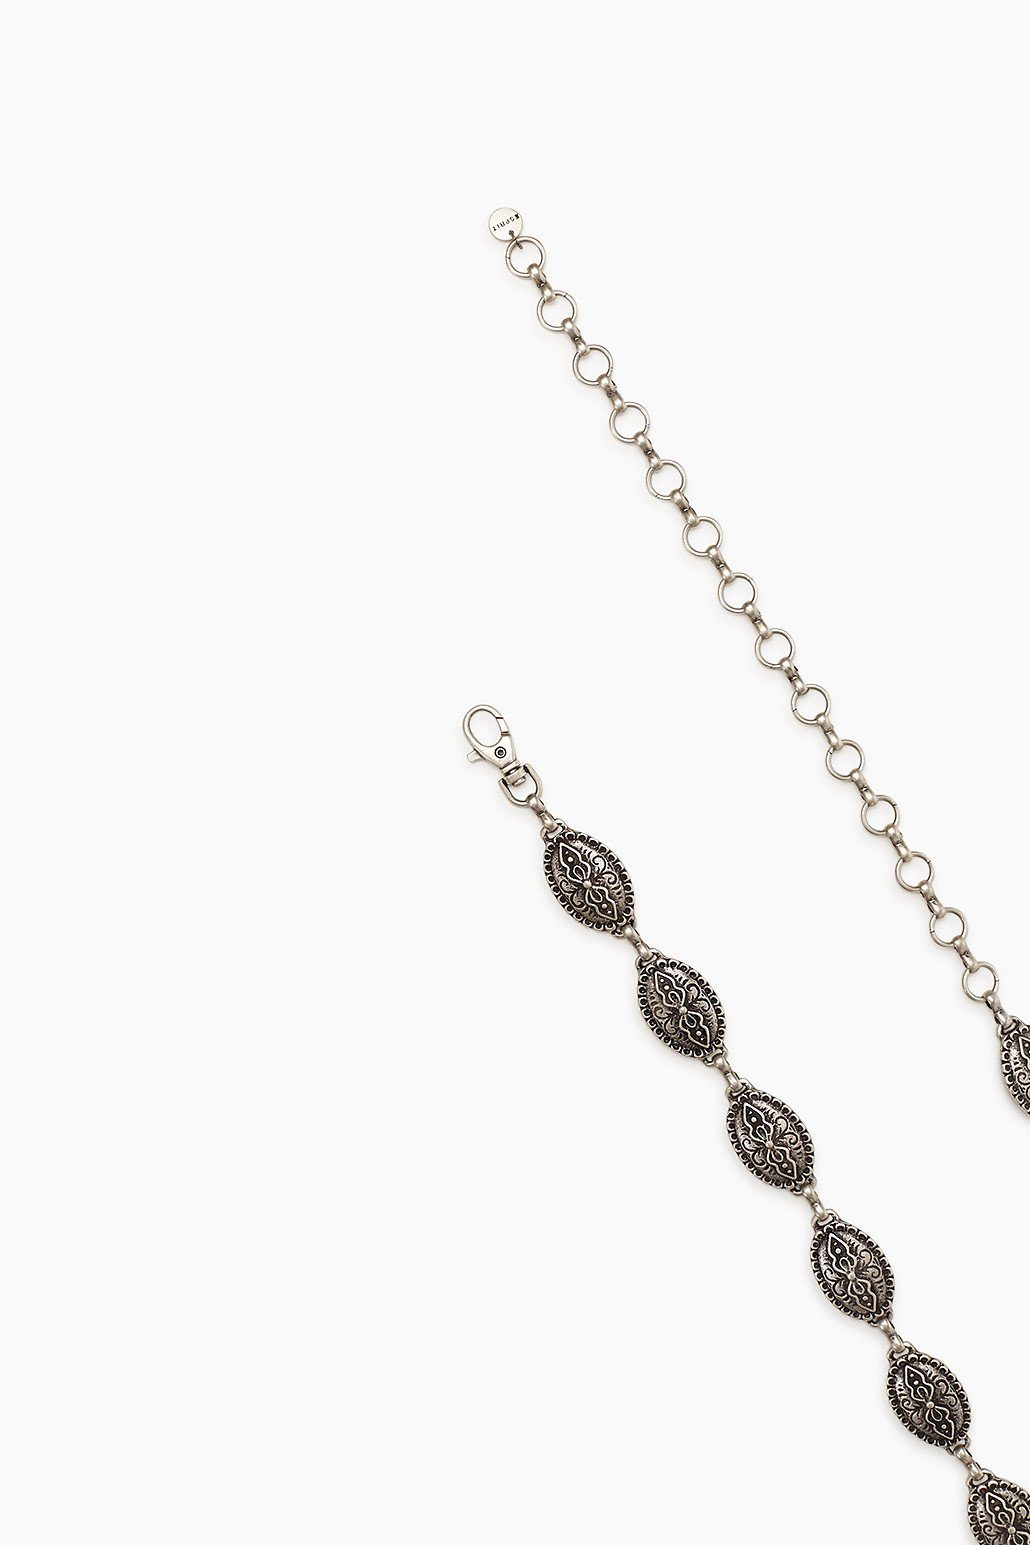 ESPRIT CASUAL Made in Italy: Kettengürtel aus Silbermetall